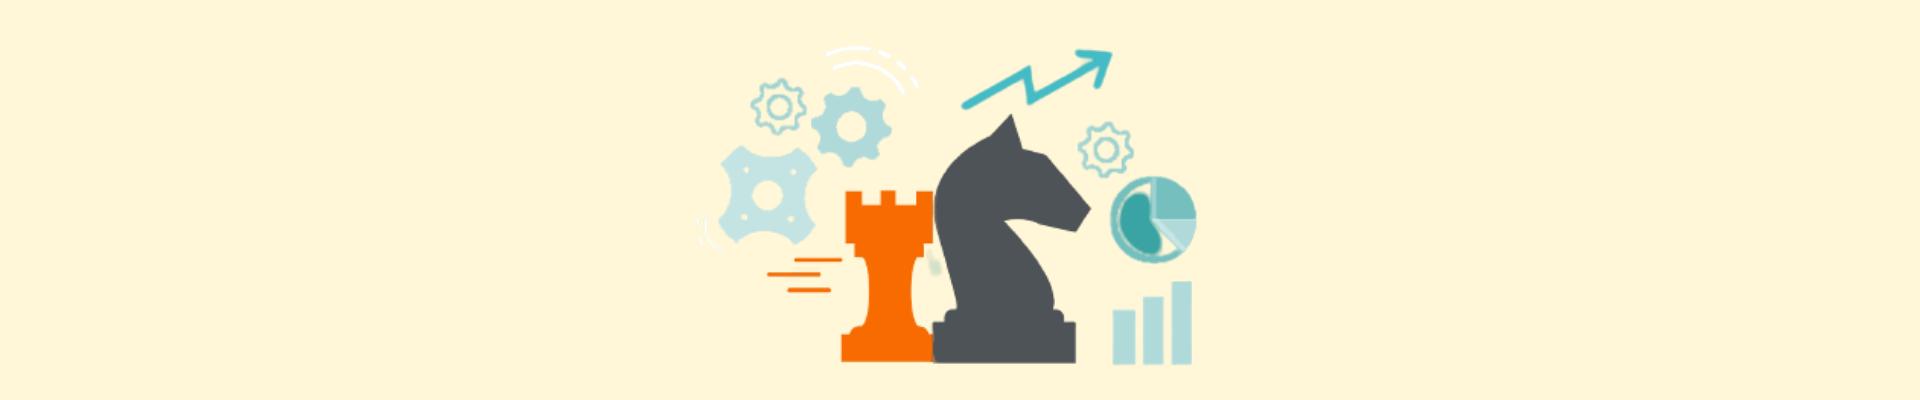 Employee Engagement Strategies Header